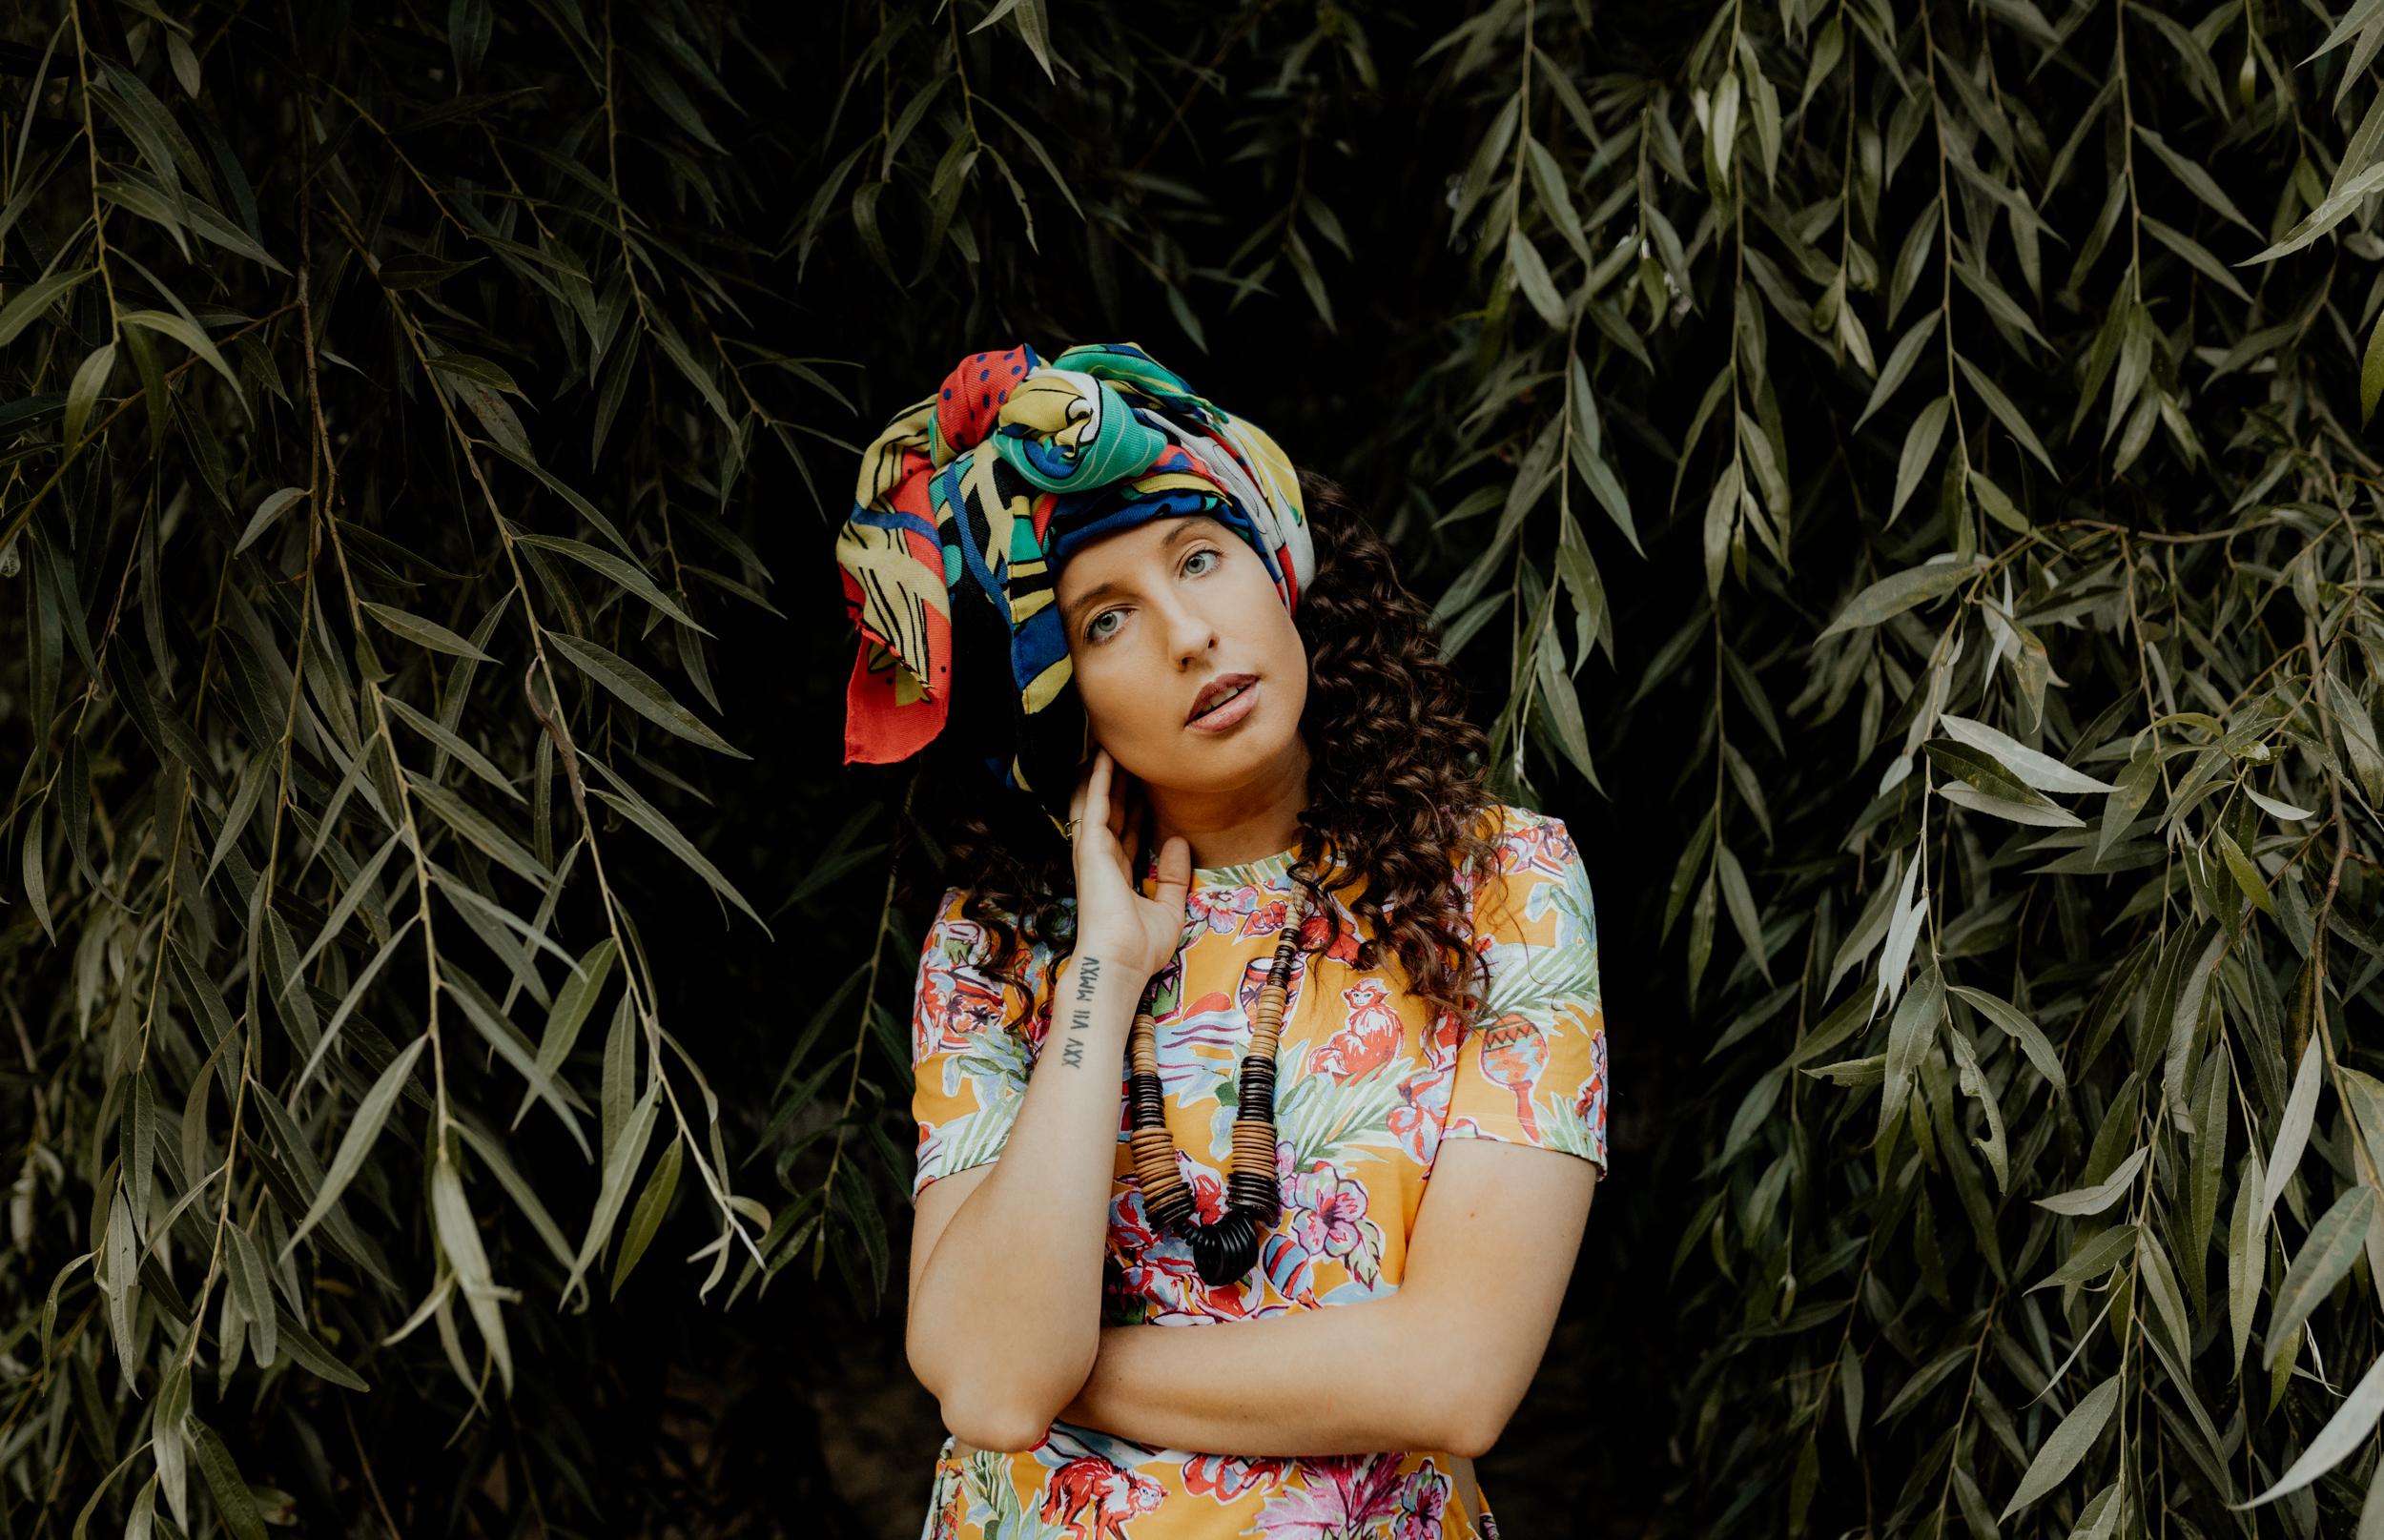 blogerka-modowa-turban-styl-afryka-safar